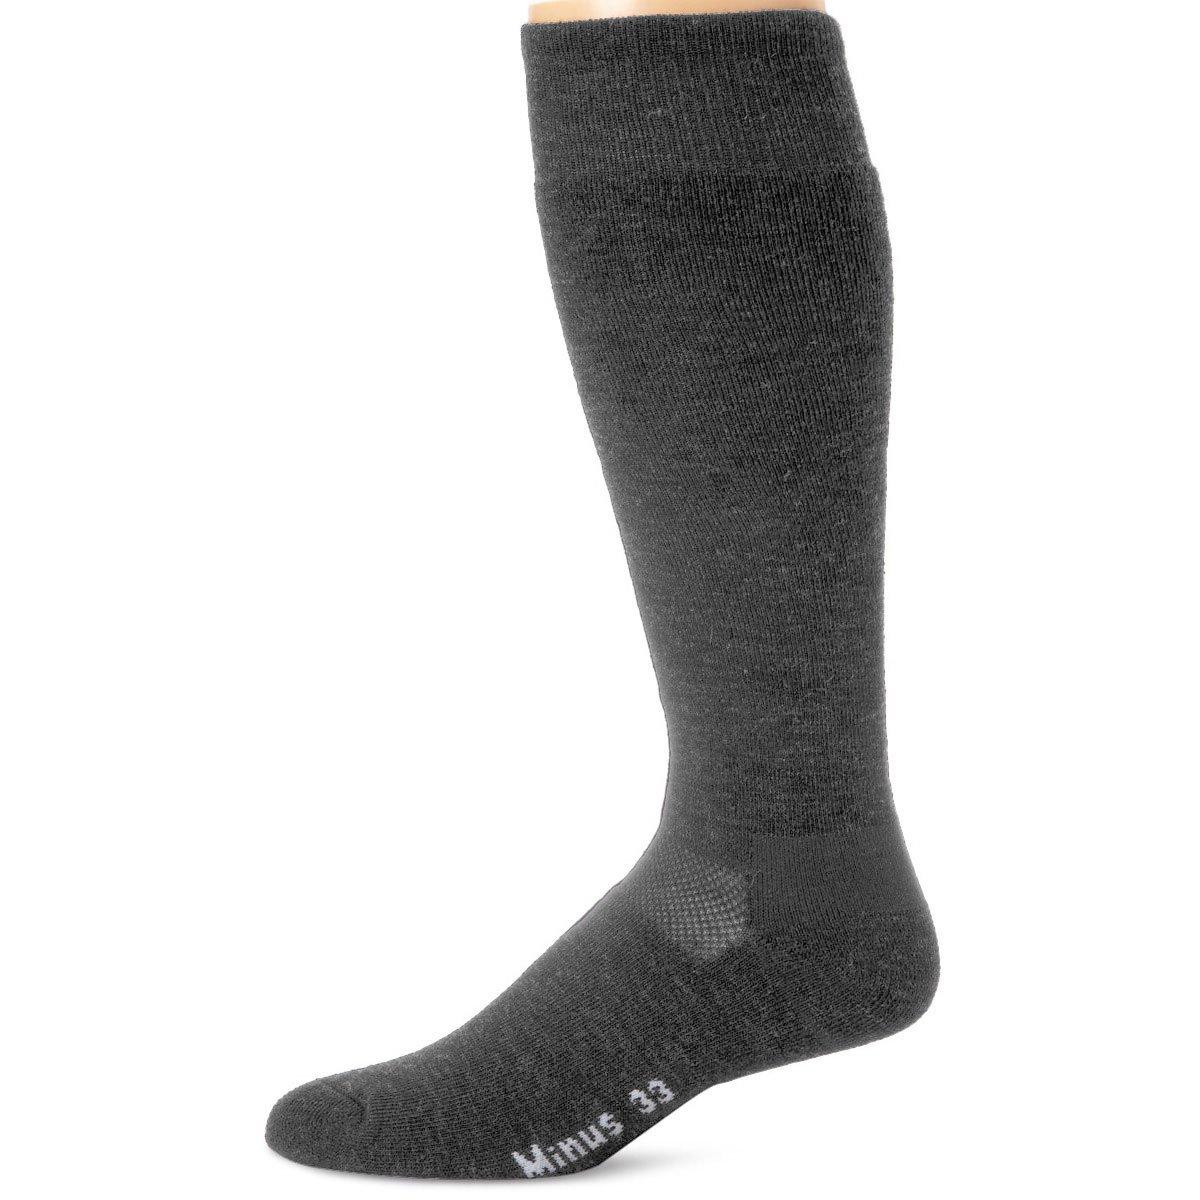 Minus33 Merino Wool Ski and Snowboard Sock MINUJ 905